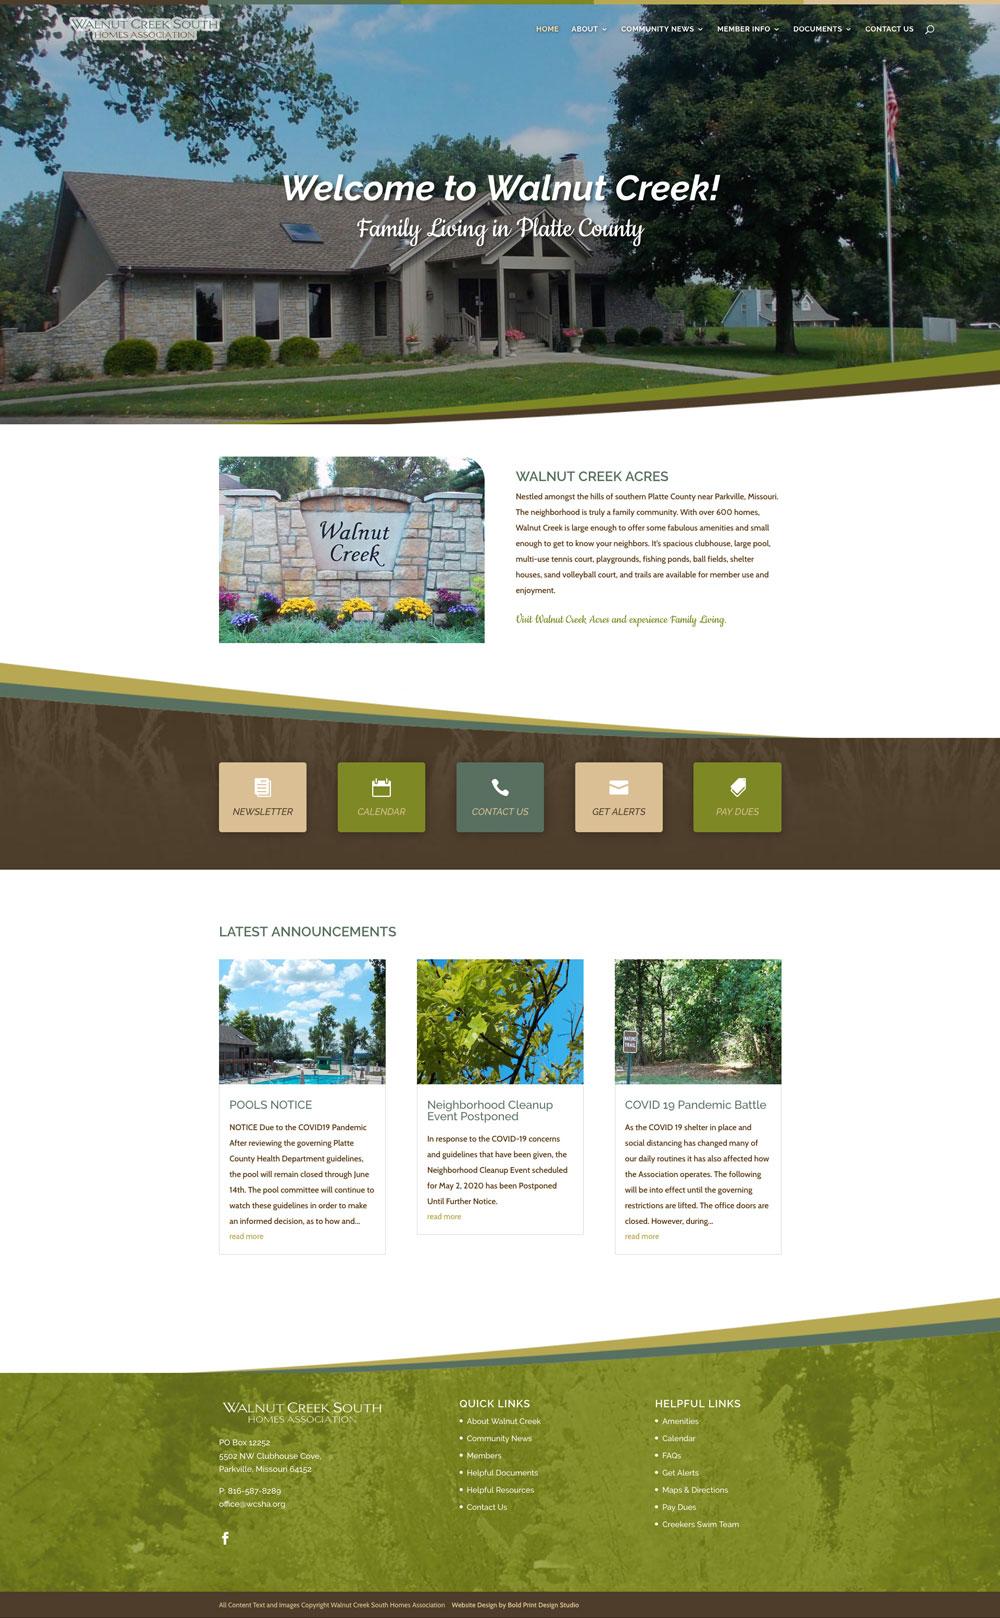 Walnut Creek South Homes Association Website